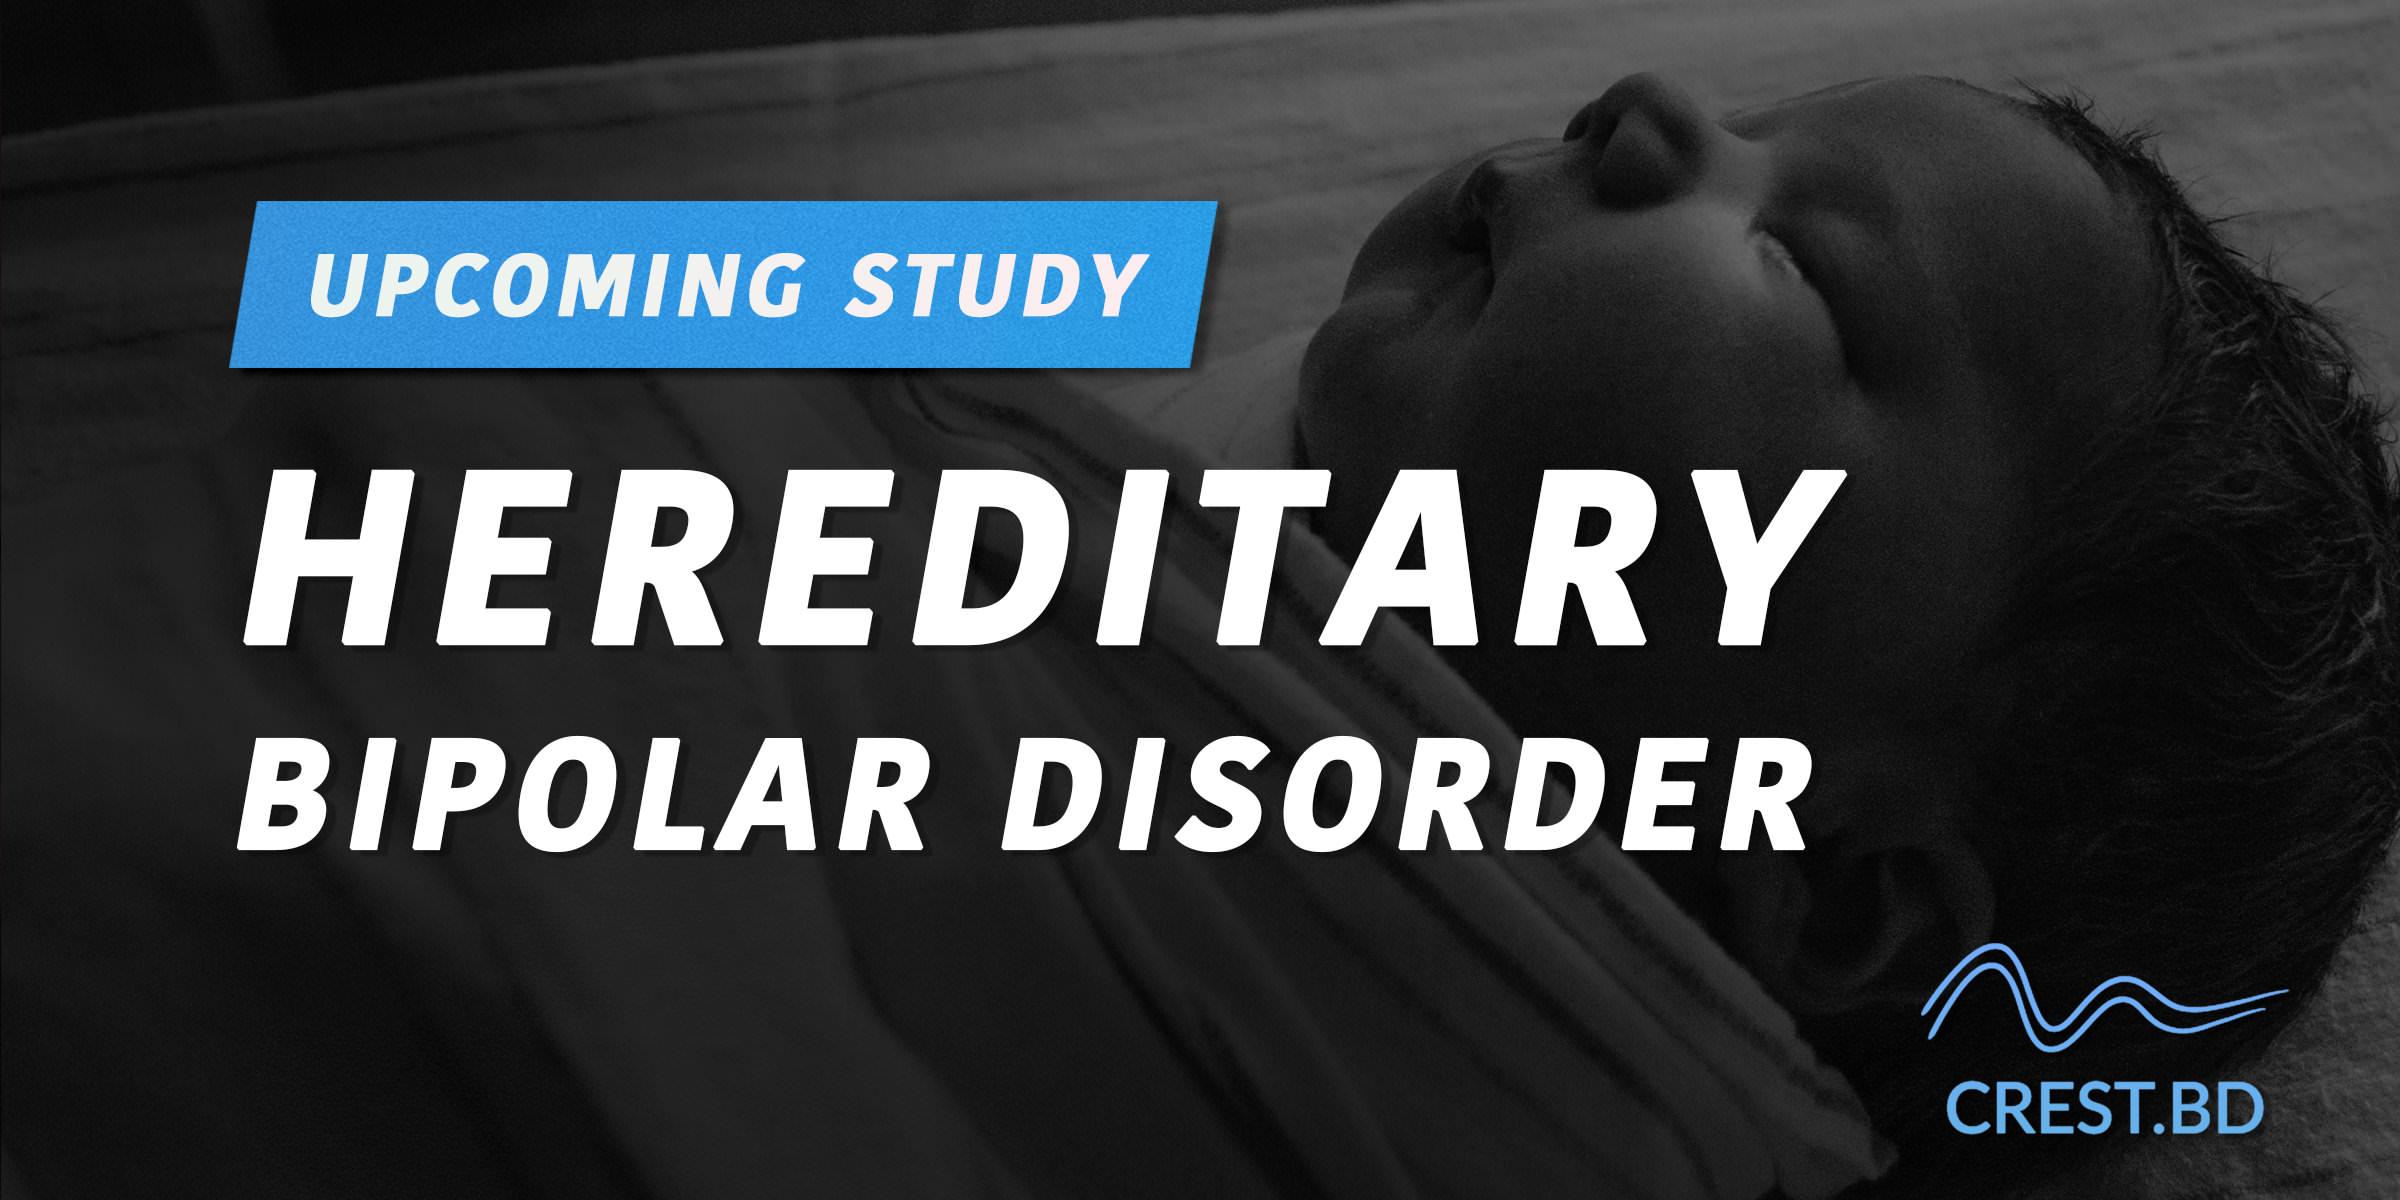 Stories of hereditary bipolar disorder, an upcoming study